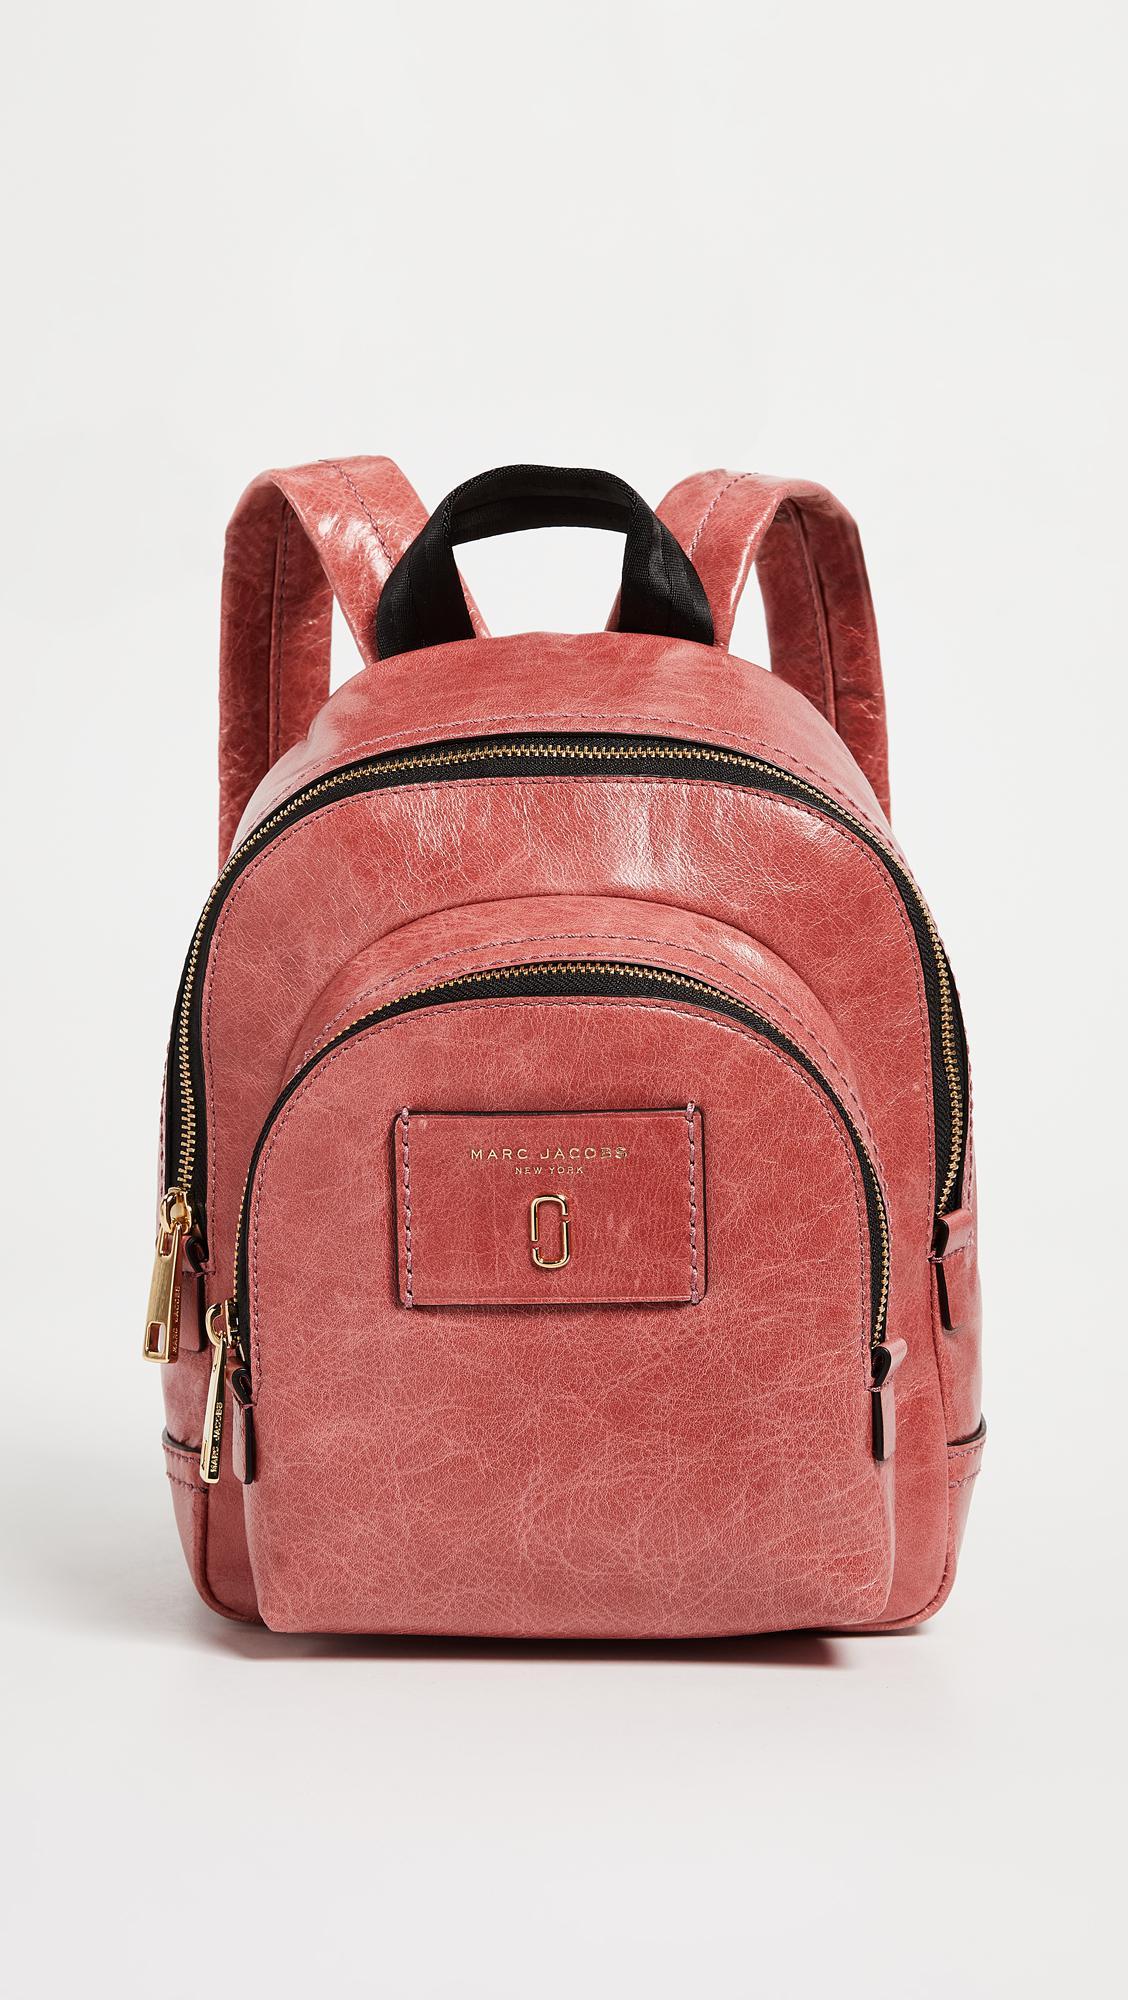 Pink Mini Double Backpack Marc Jacobs 3jEYxXeZo